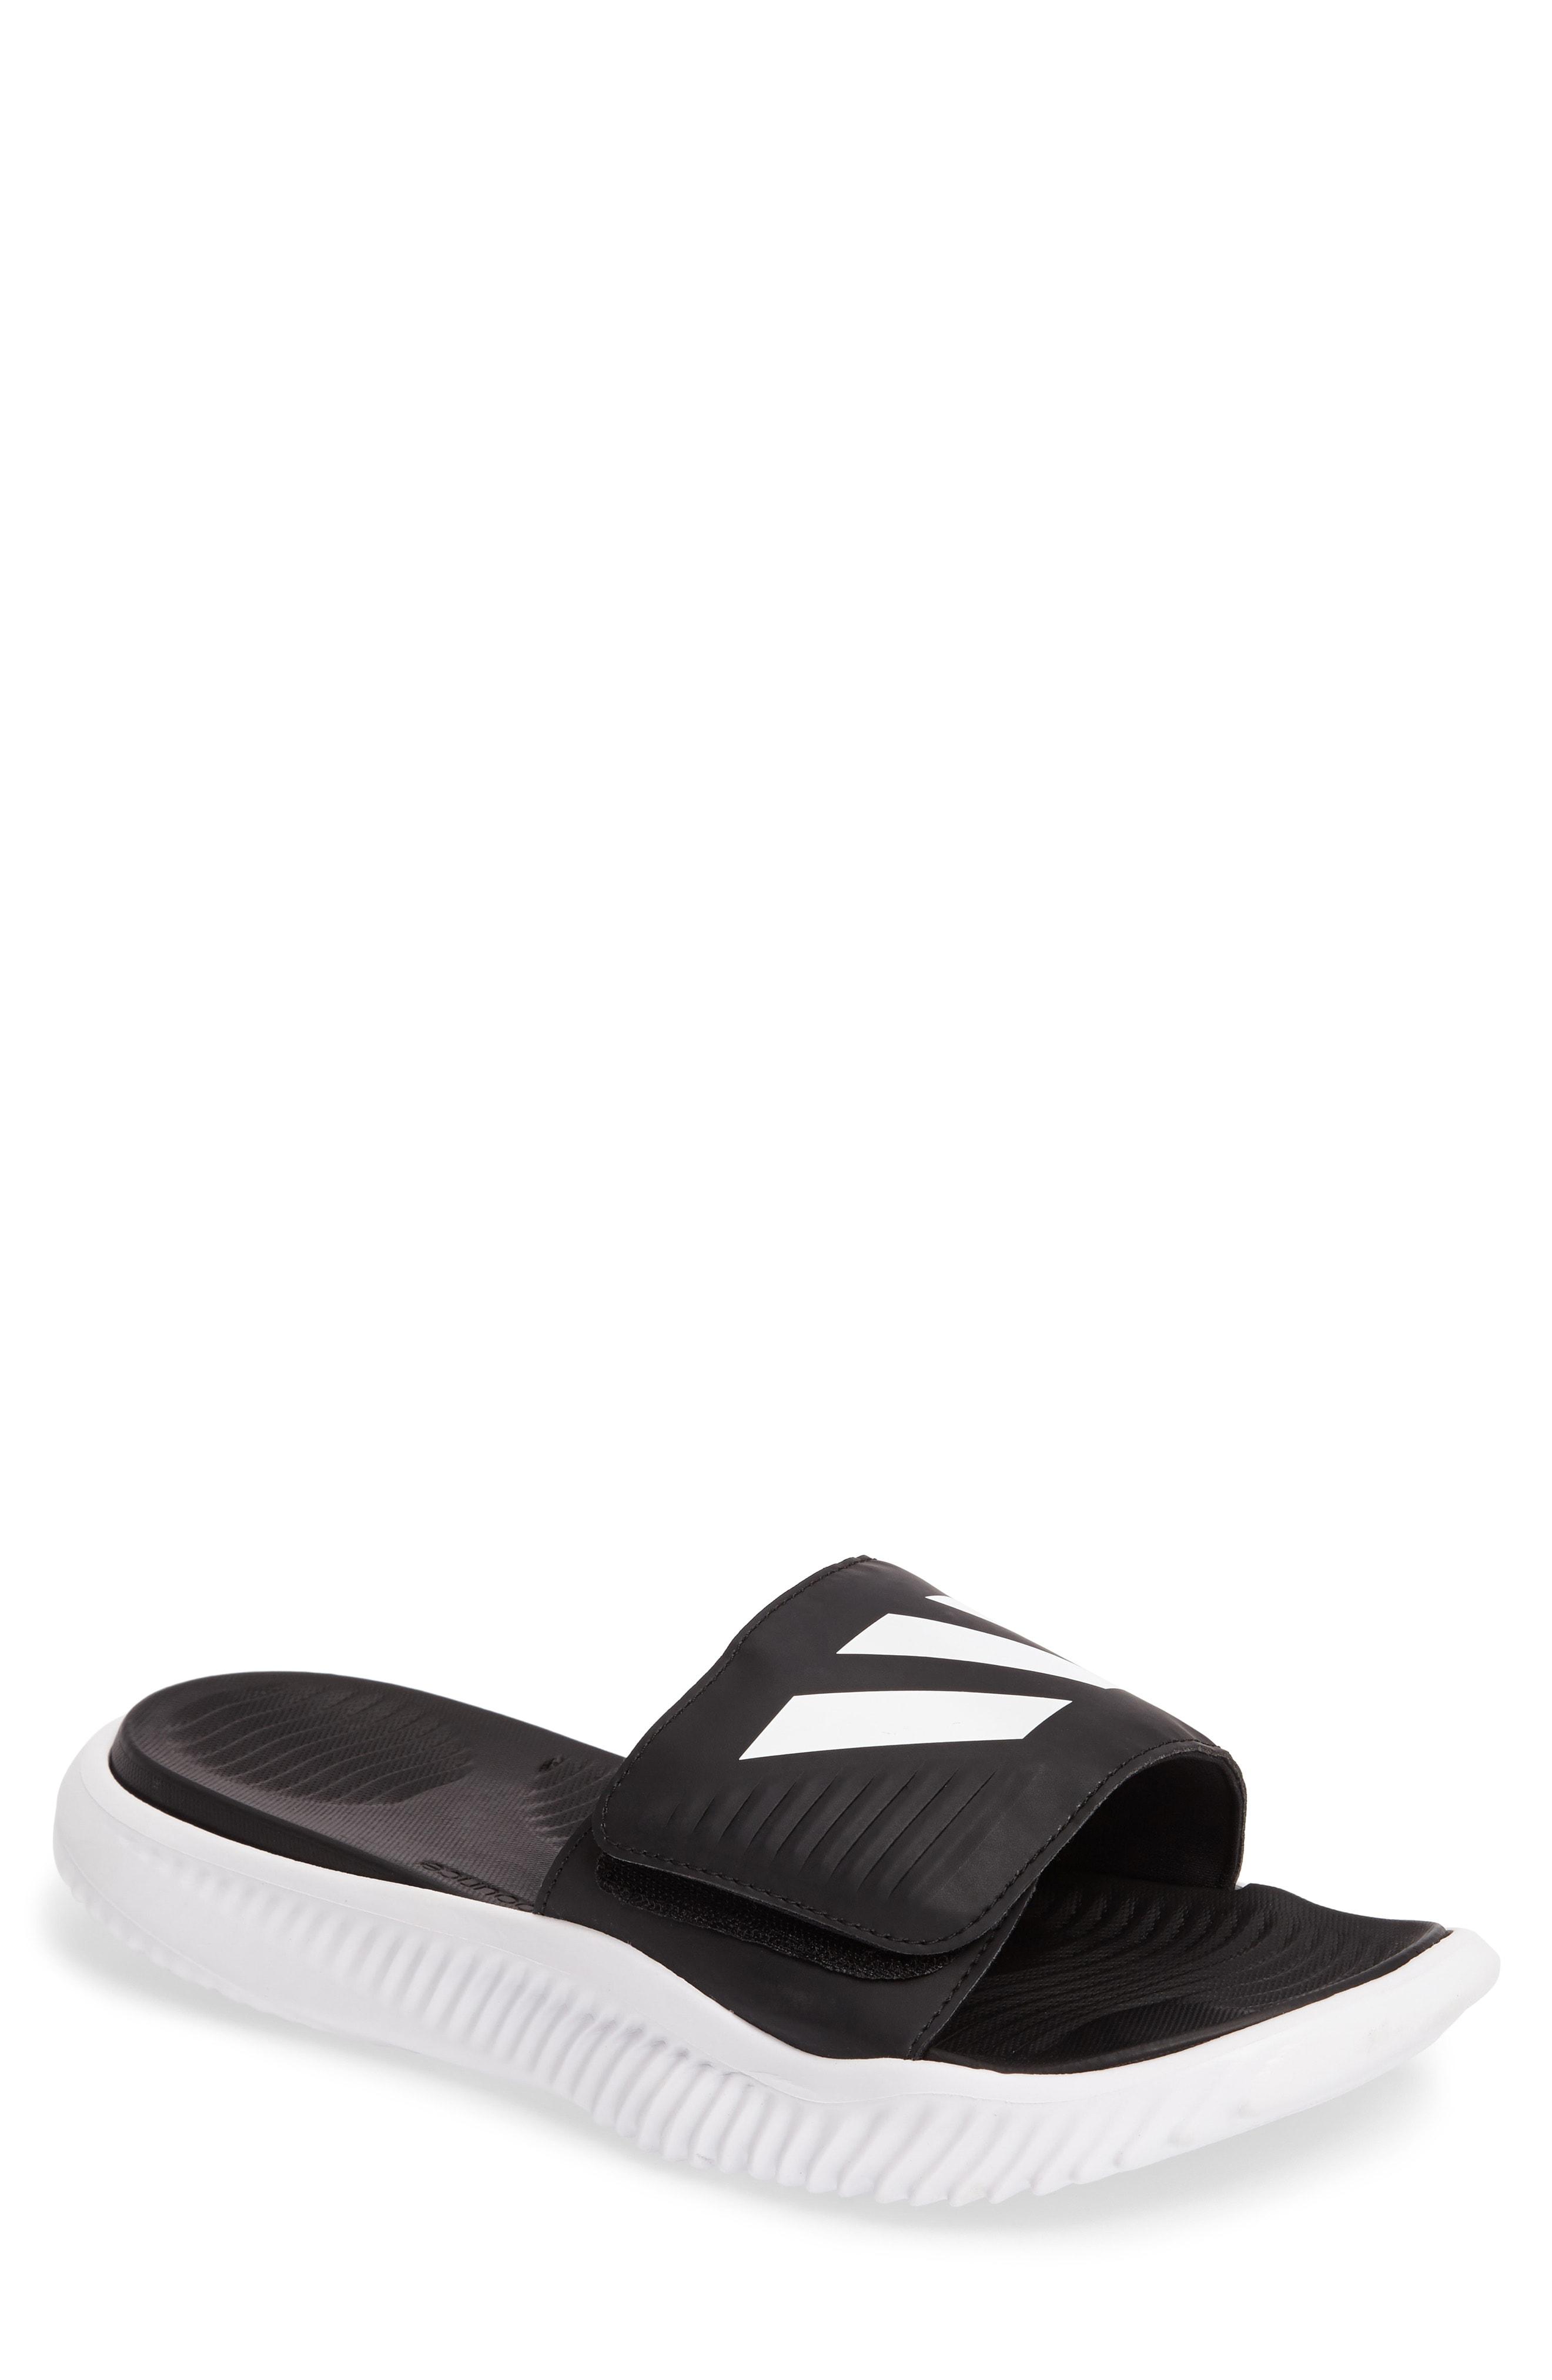 74aaec181cad Adidas Originals Alphabounce Slide Sandal In White Core Black White ...